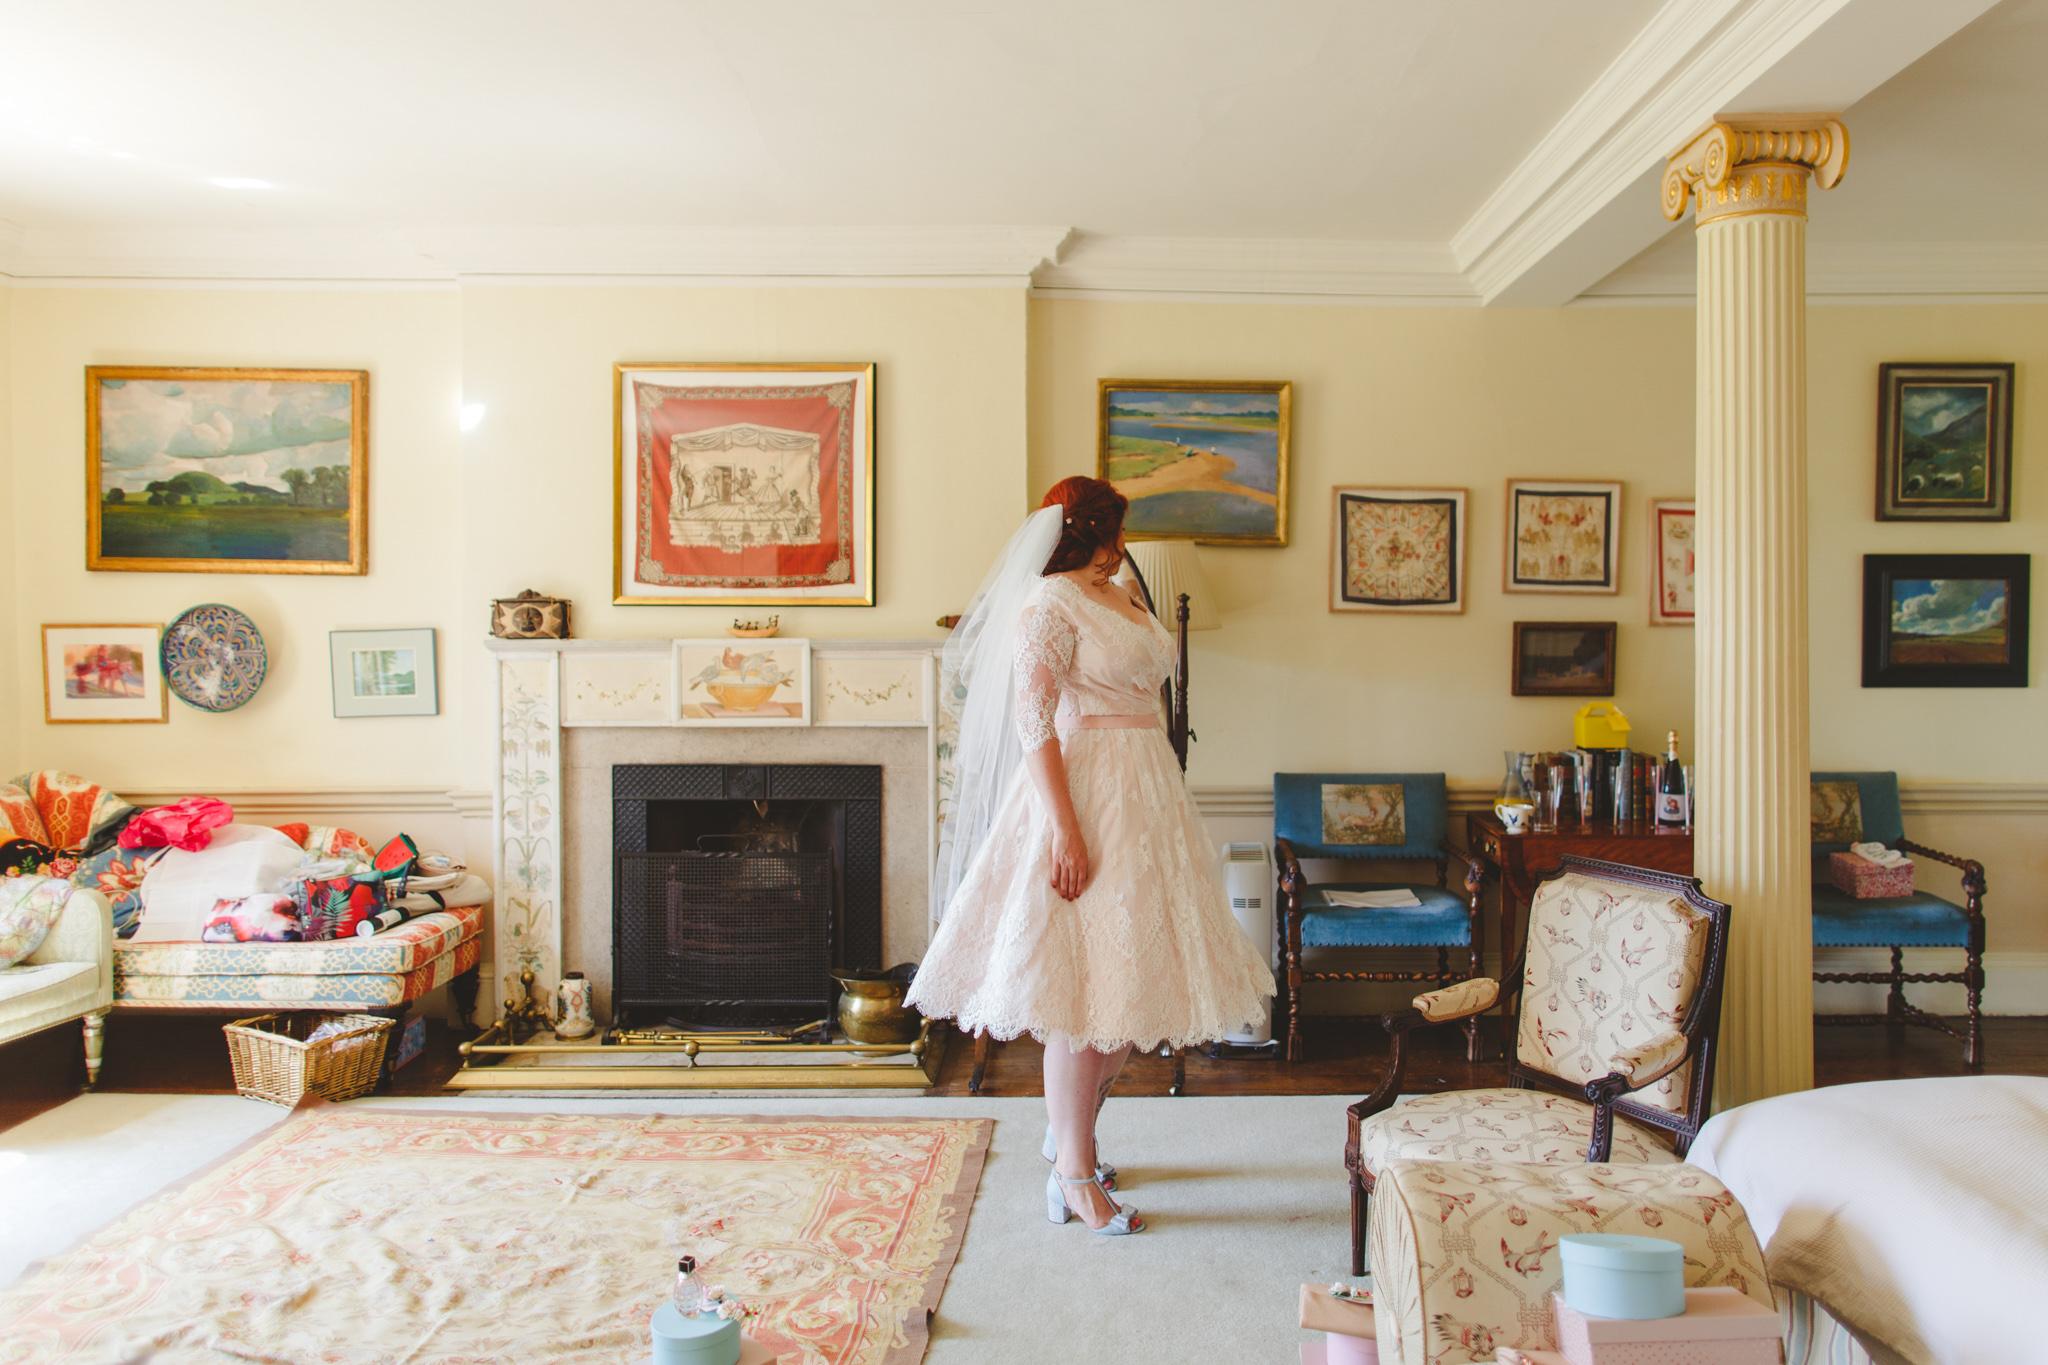 derbyshire-wedding-photographer-videographer-camera-hannah-79.jpg